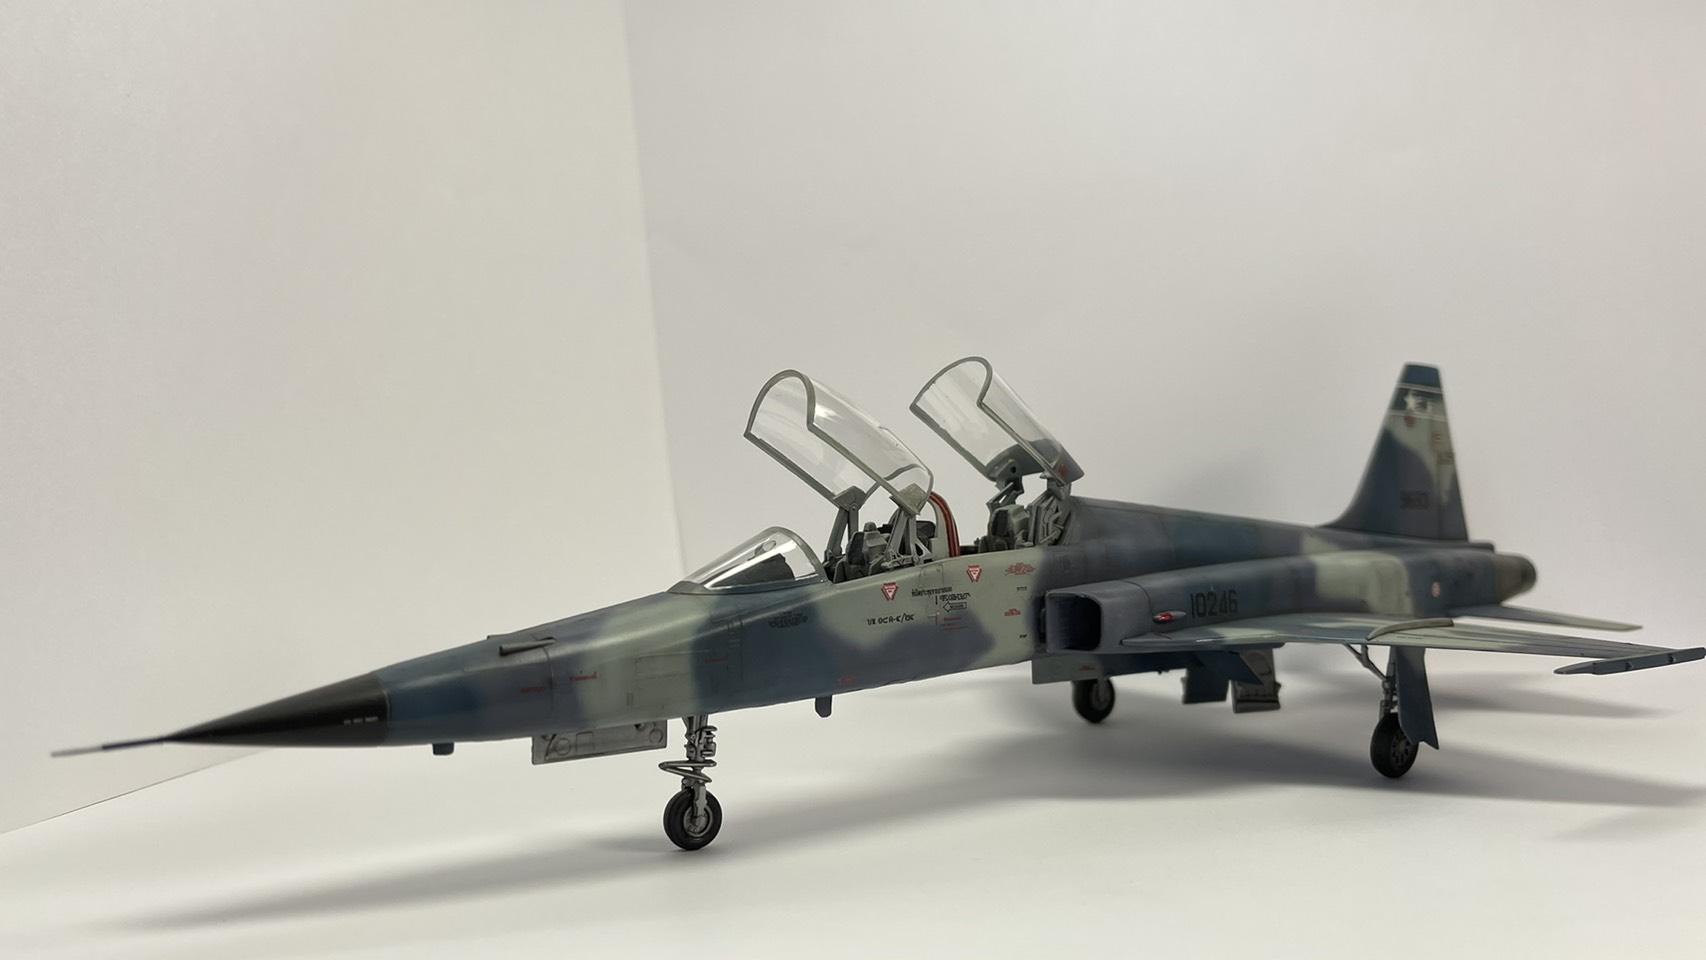 +[ShowOff] F-5F บข.๑๘ค 1/48 โดย BOY